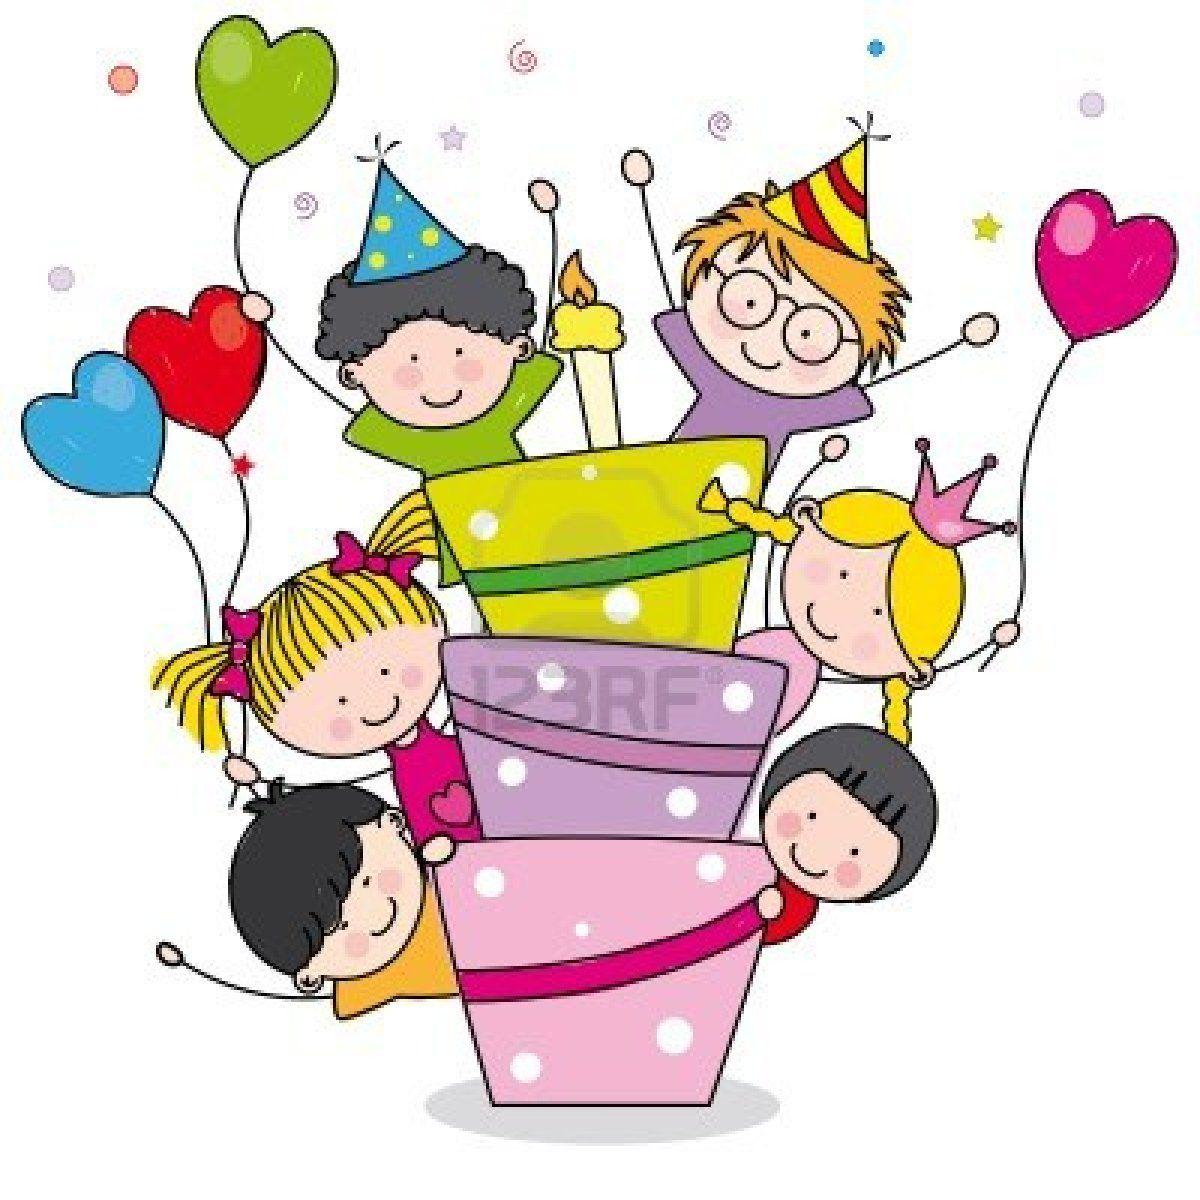 imagenes de celebrar cumplea os google search celebraciones rh pinterest co uk Birthday Candles Clip Art Free Funny Birthday Cartoons Free